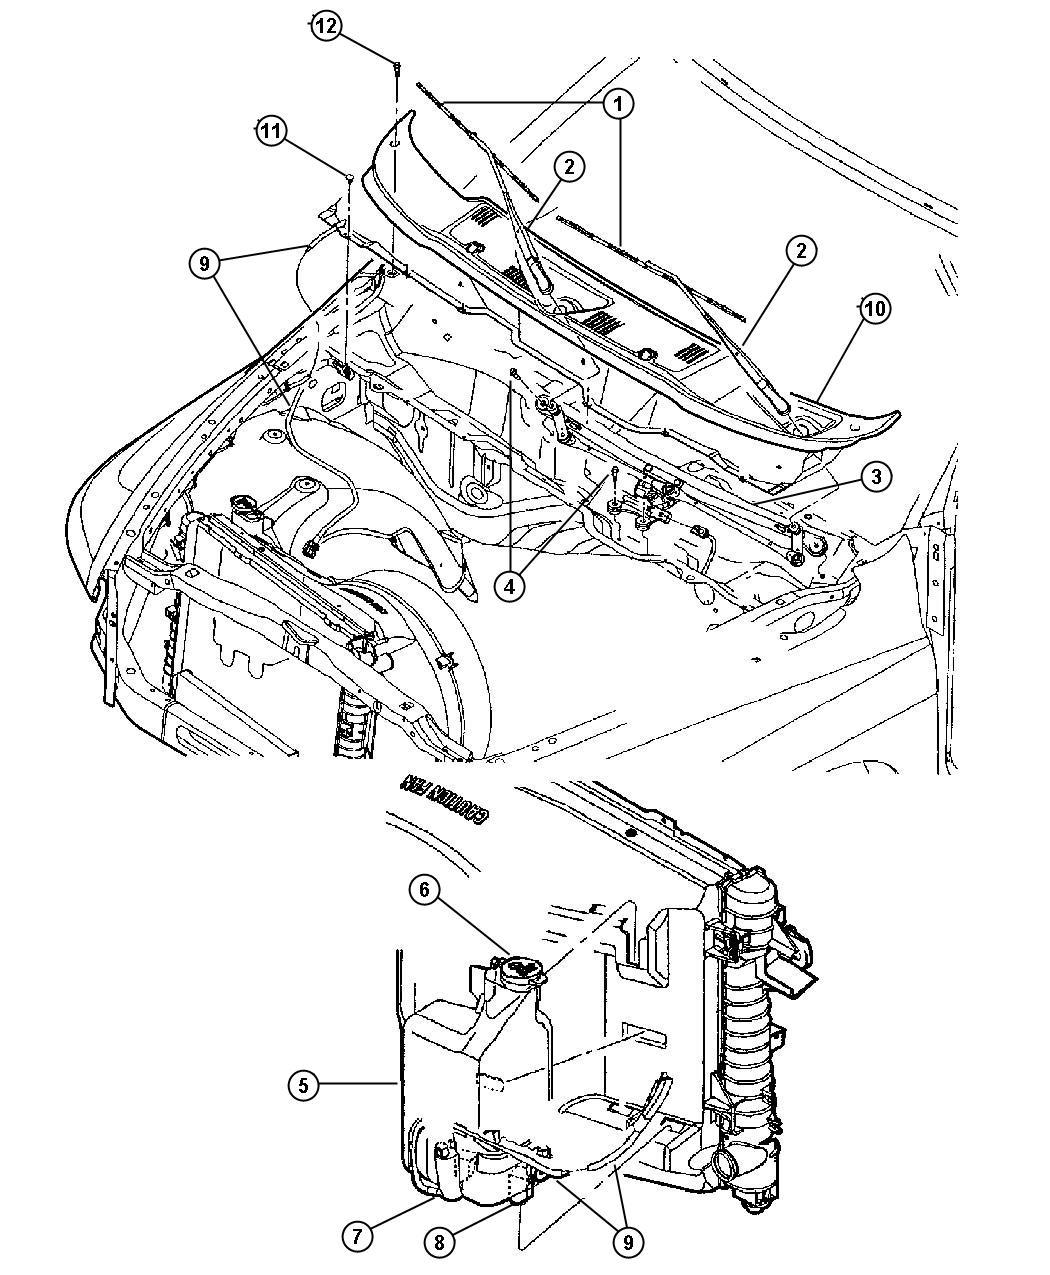 2004 Dodge Ram 1500 Windshield Wiper & Washer